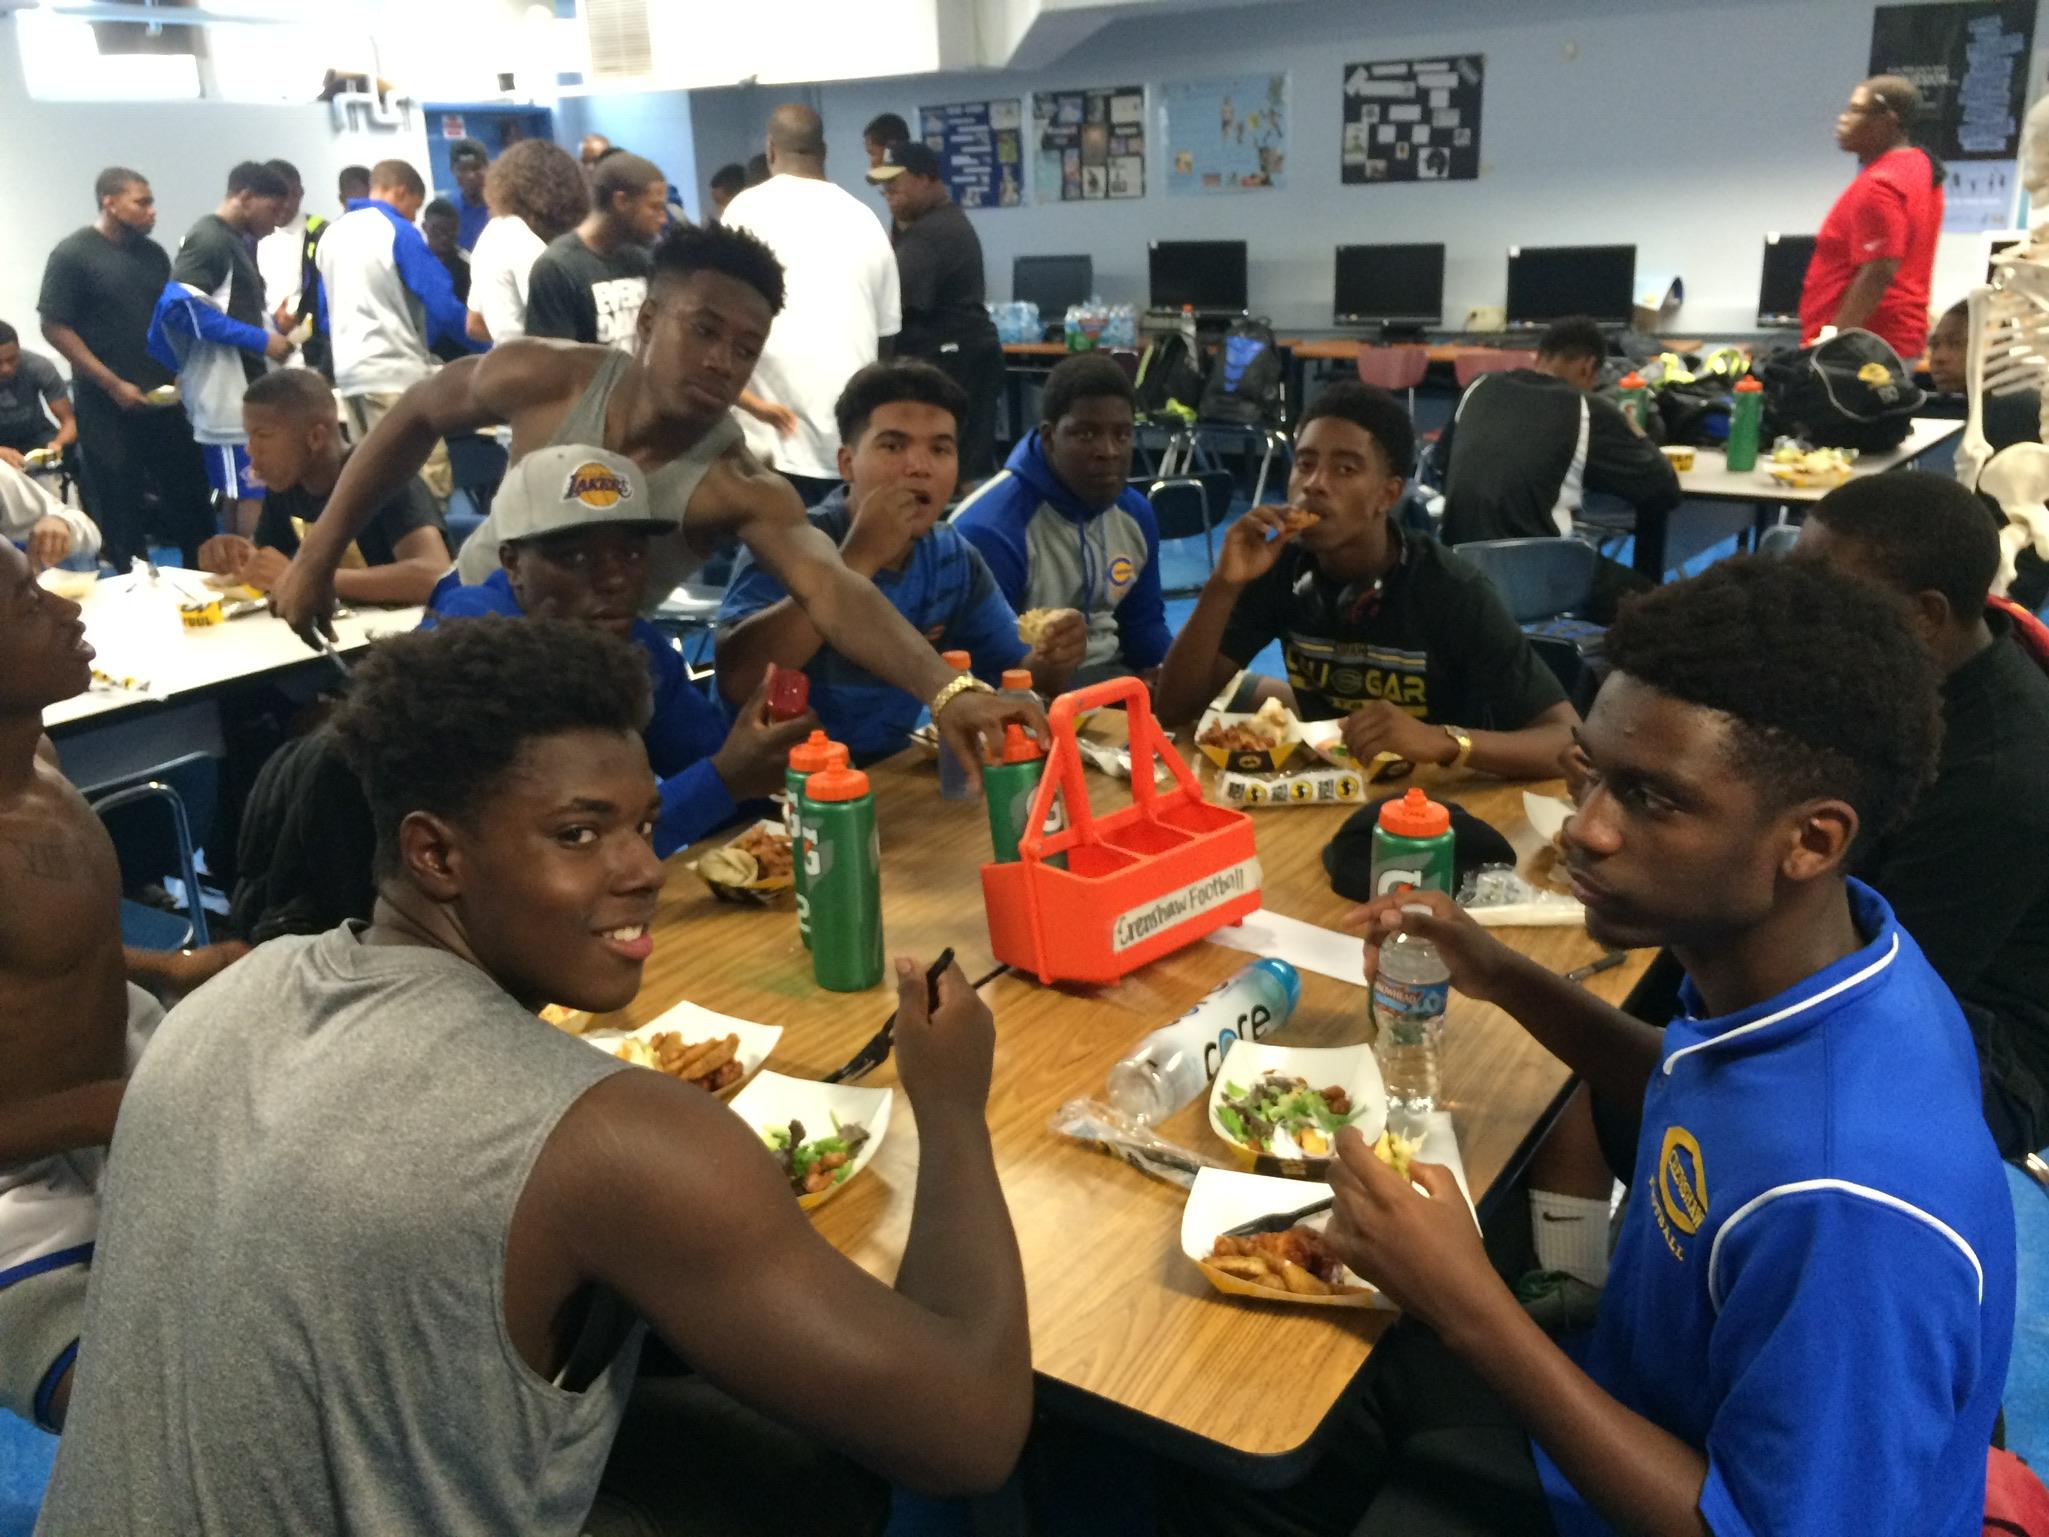 Crenshaw High School Football Team